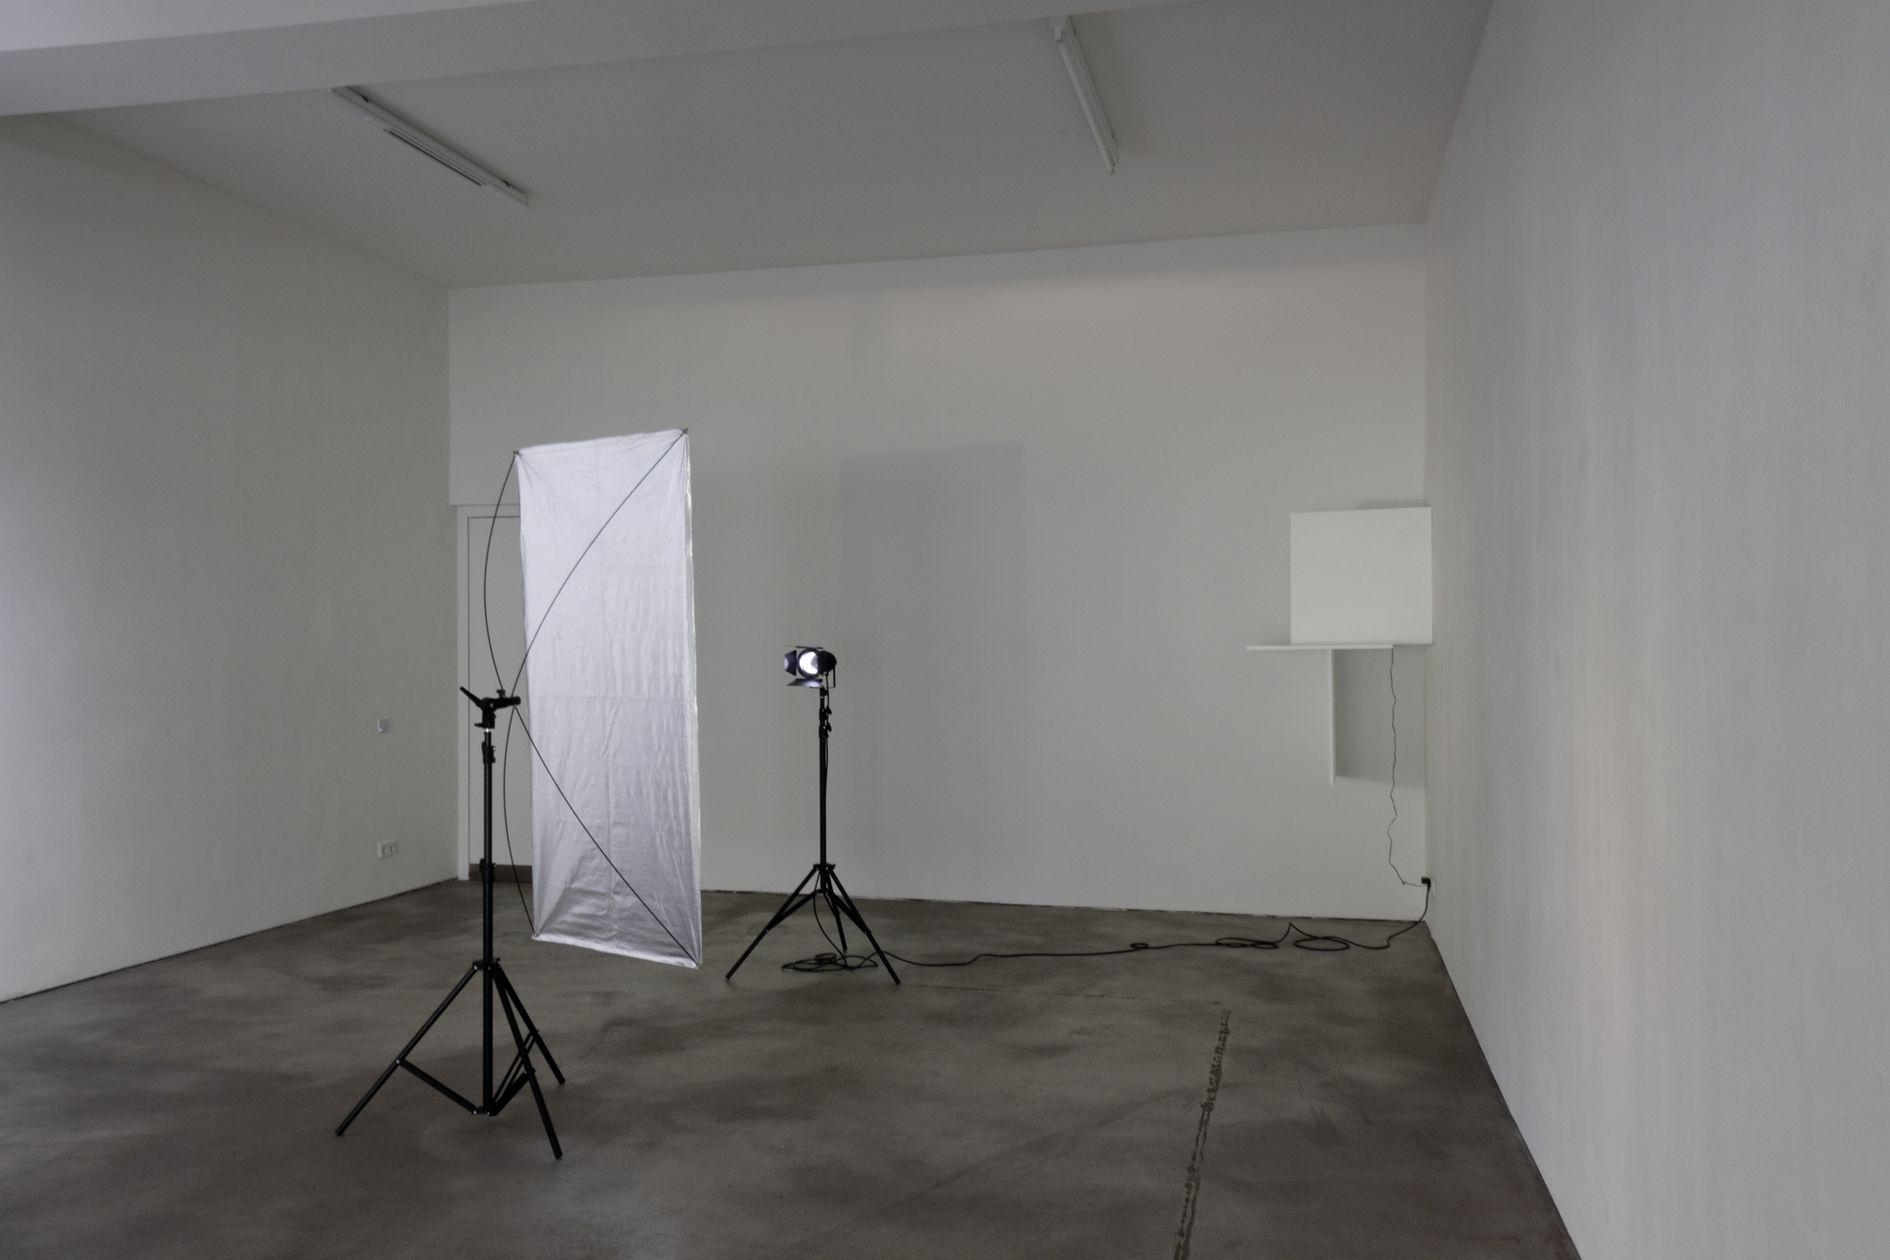 David Maljkovic – A Long Day for the Form – Berlin